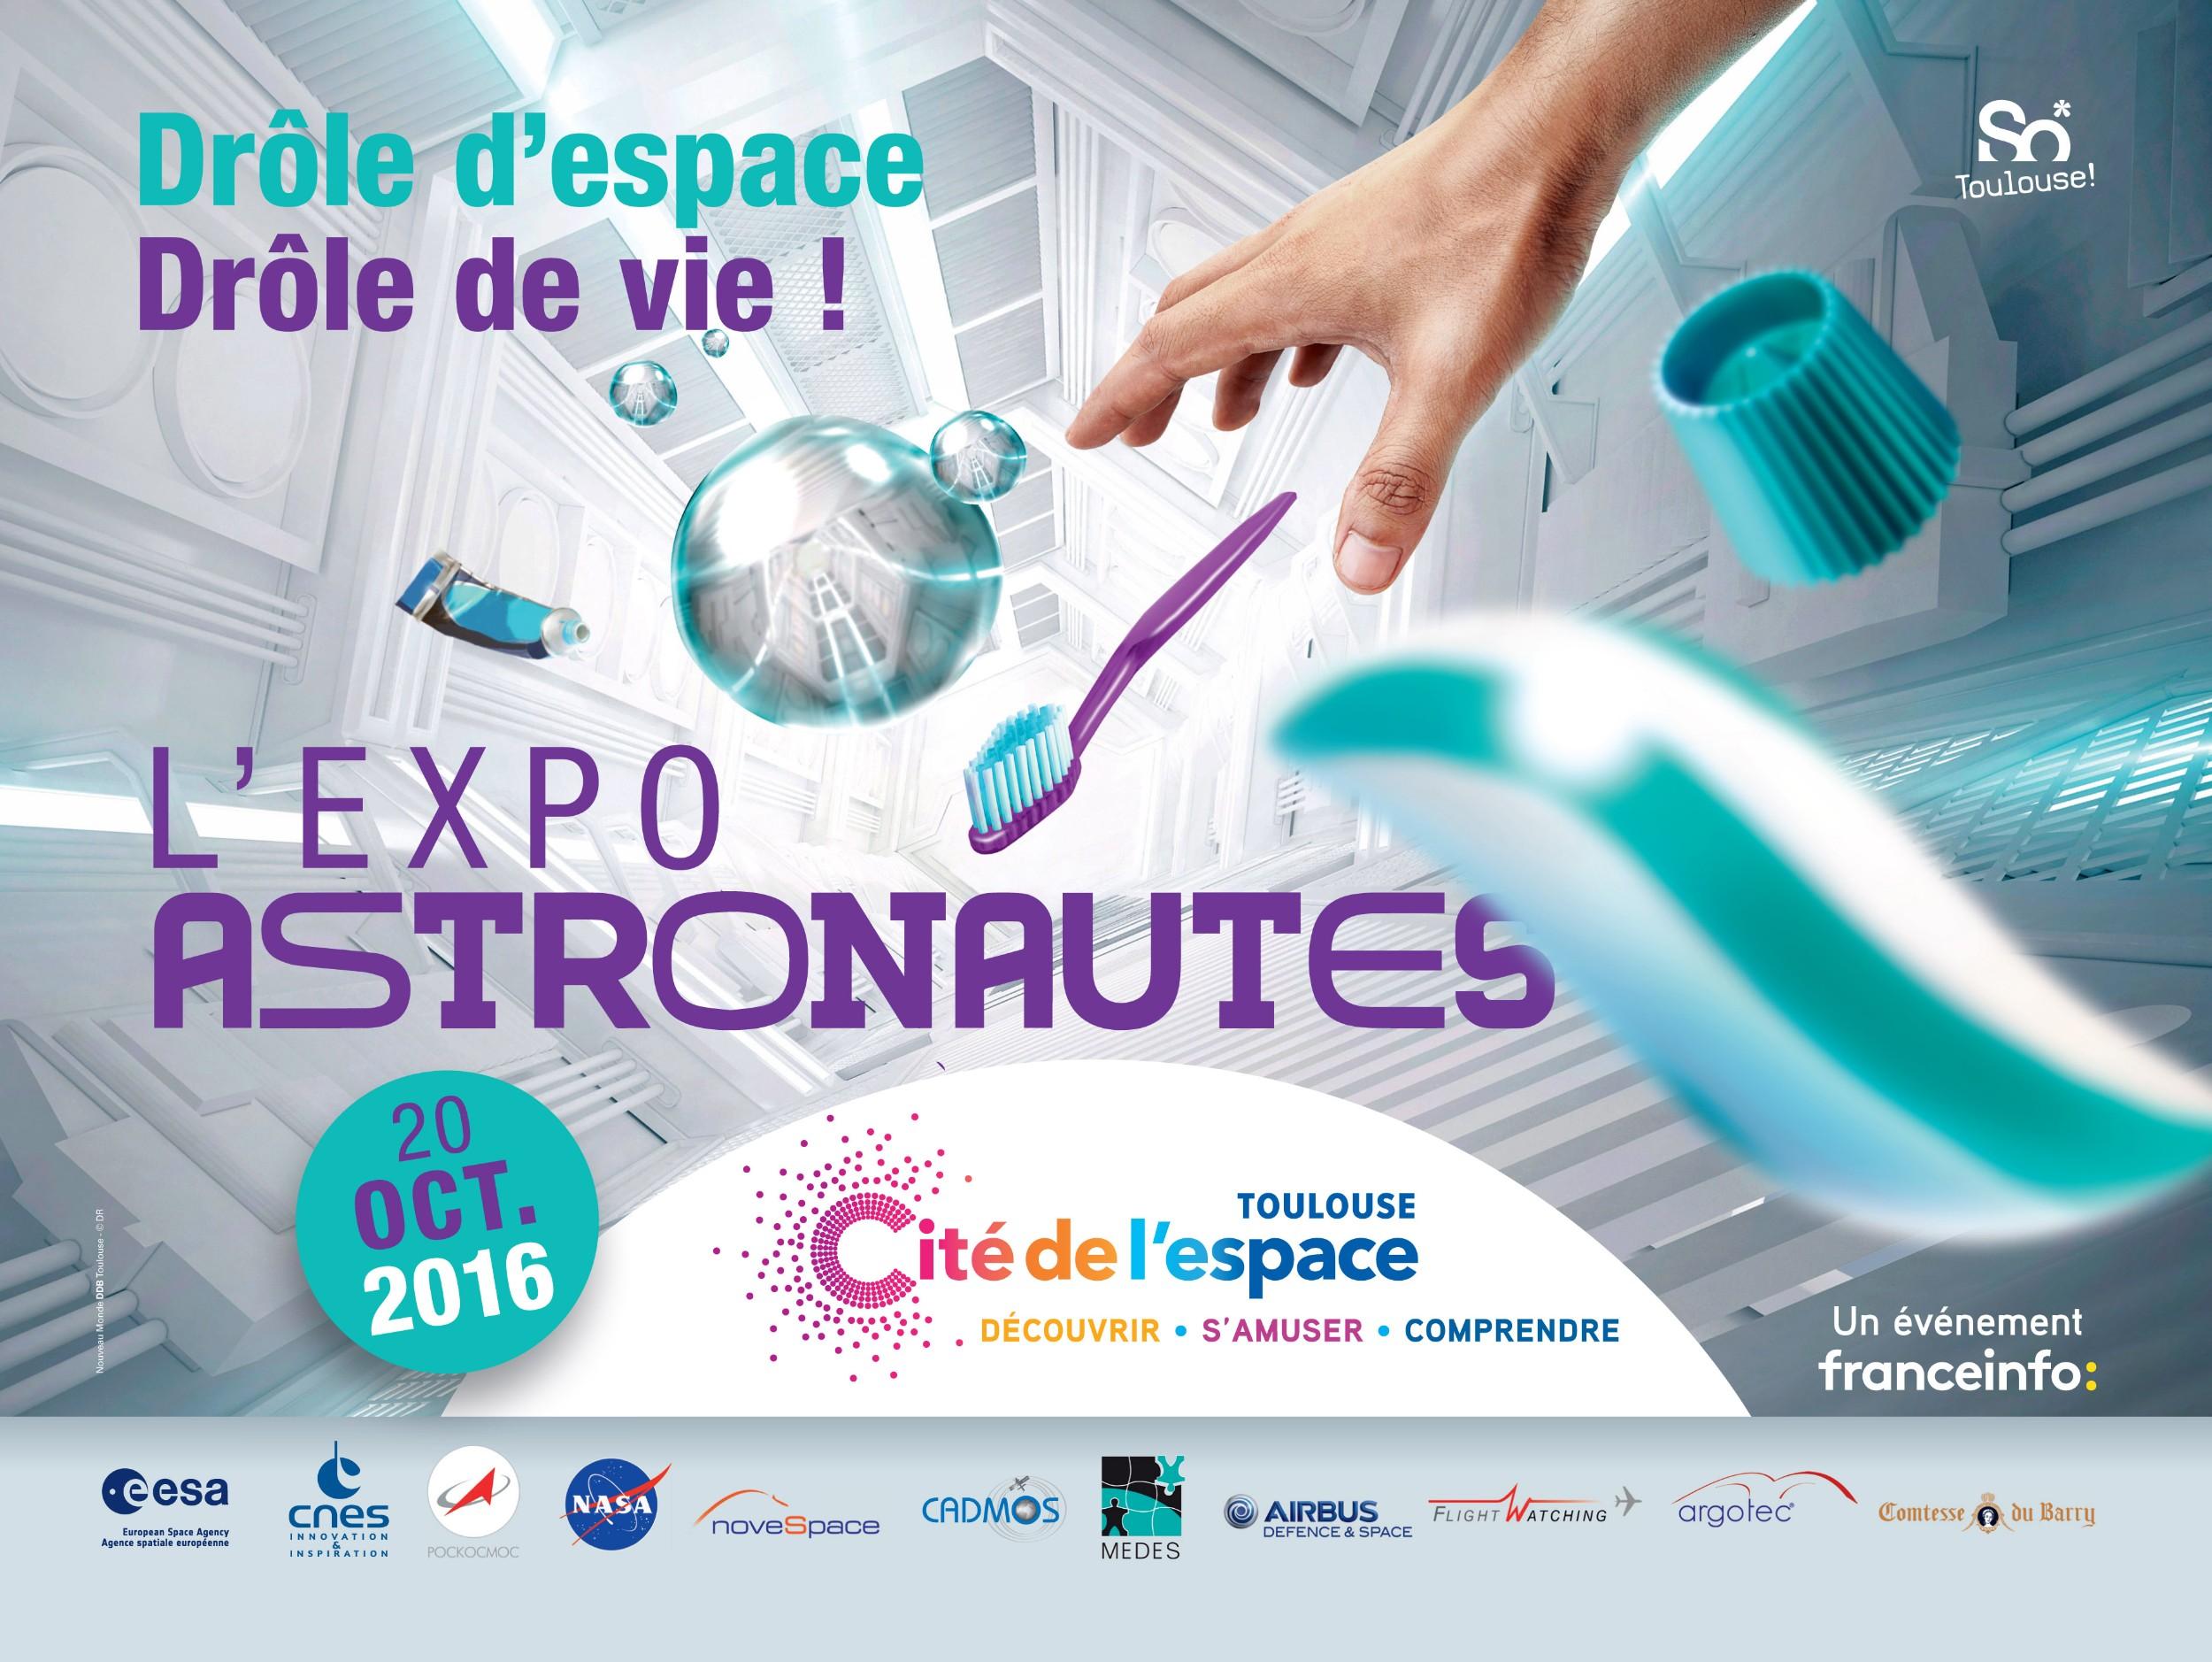 astronautes-expo-cite-espace-toulouse